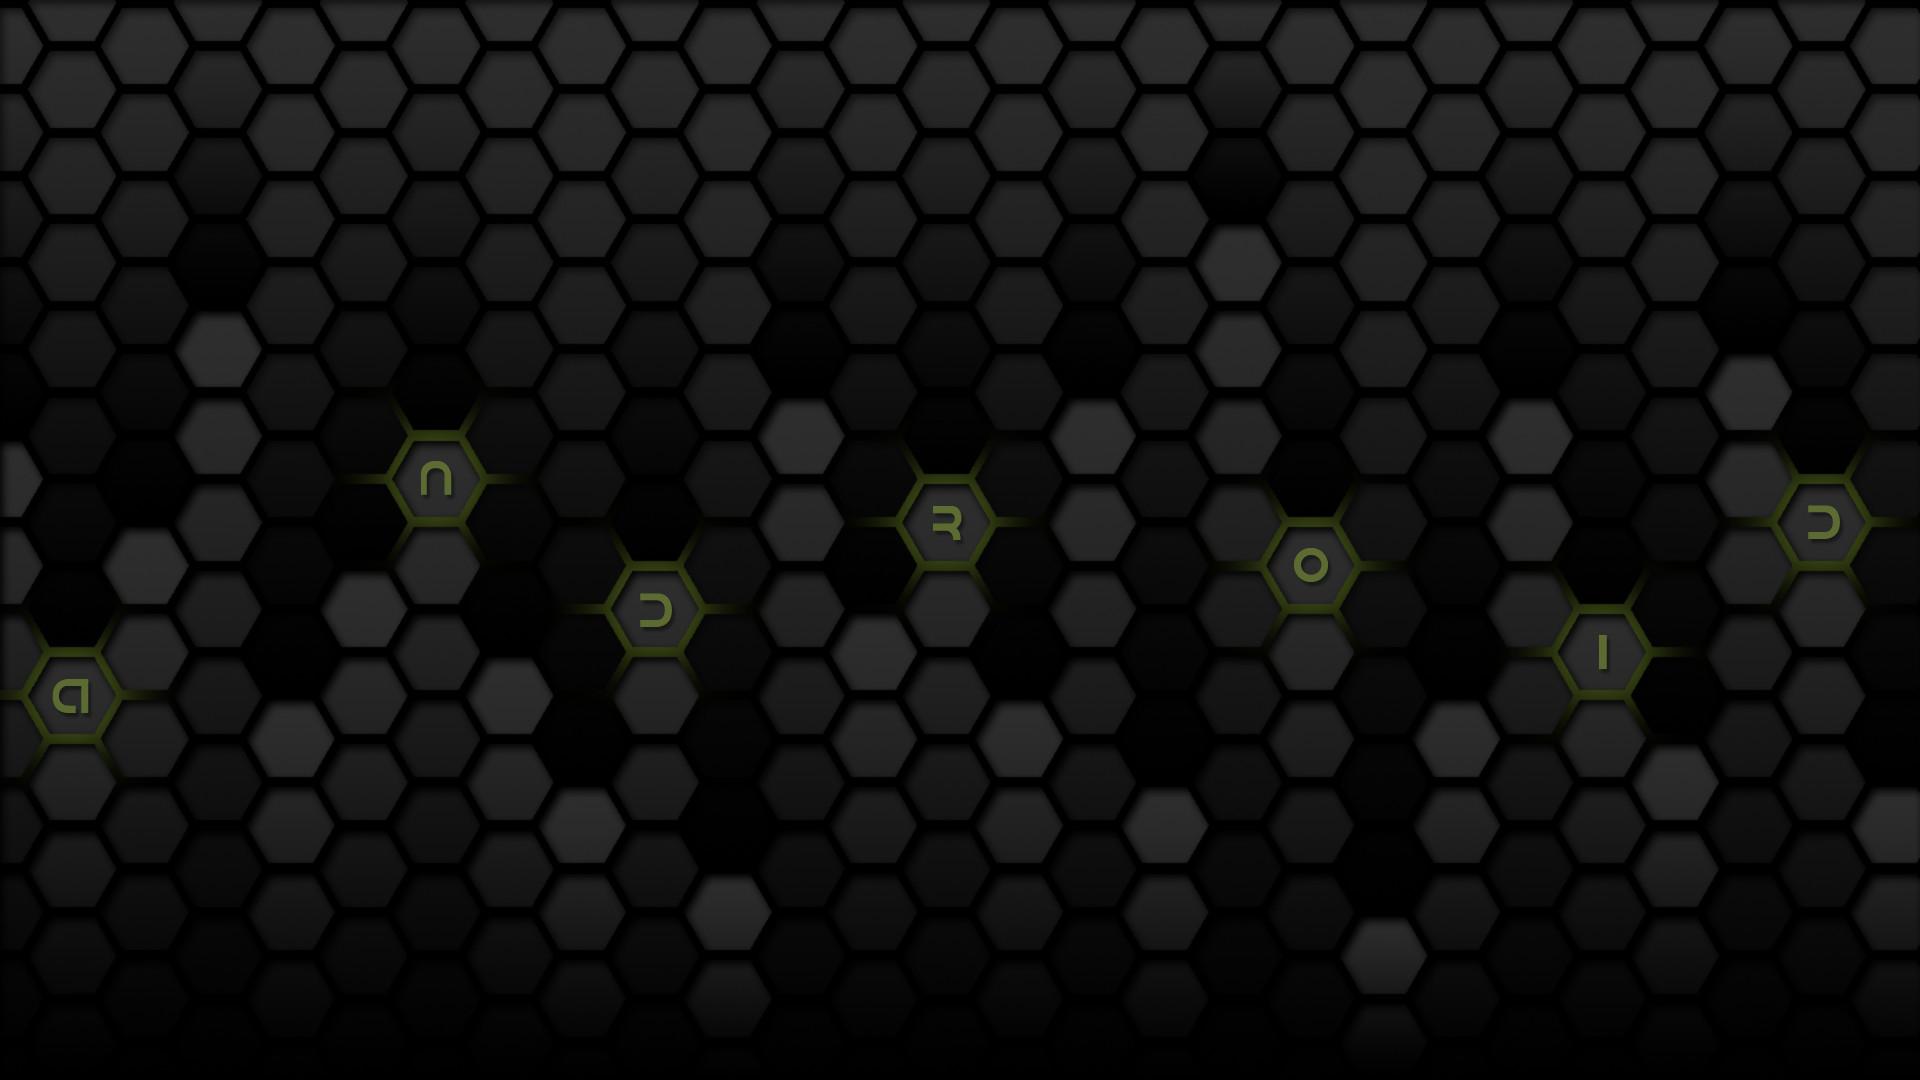 … Free Android Wallpapers | WallpaperSafari